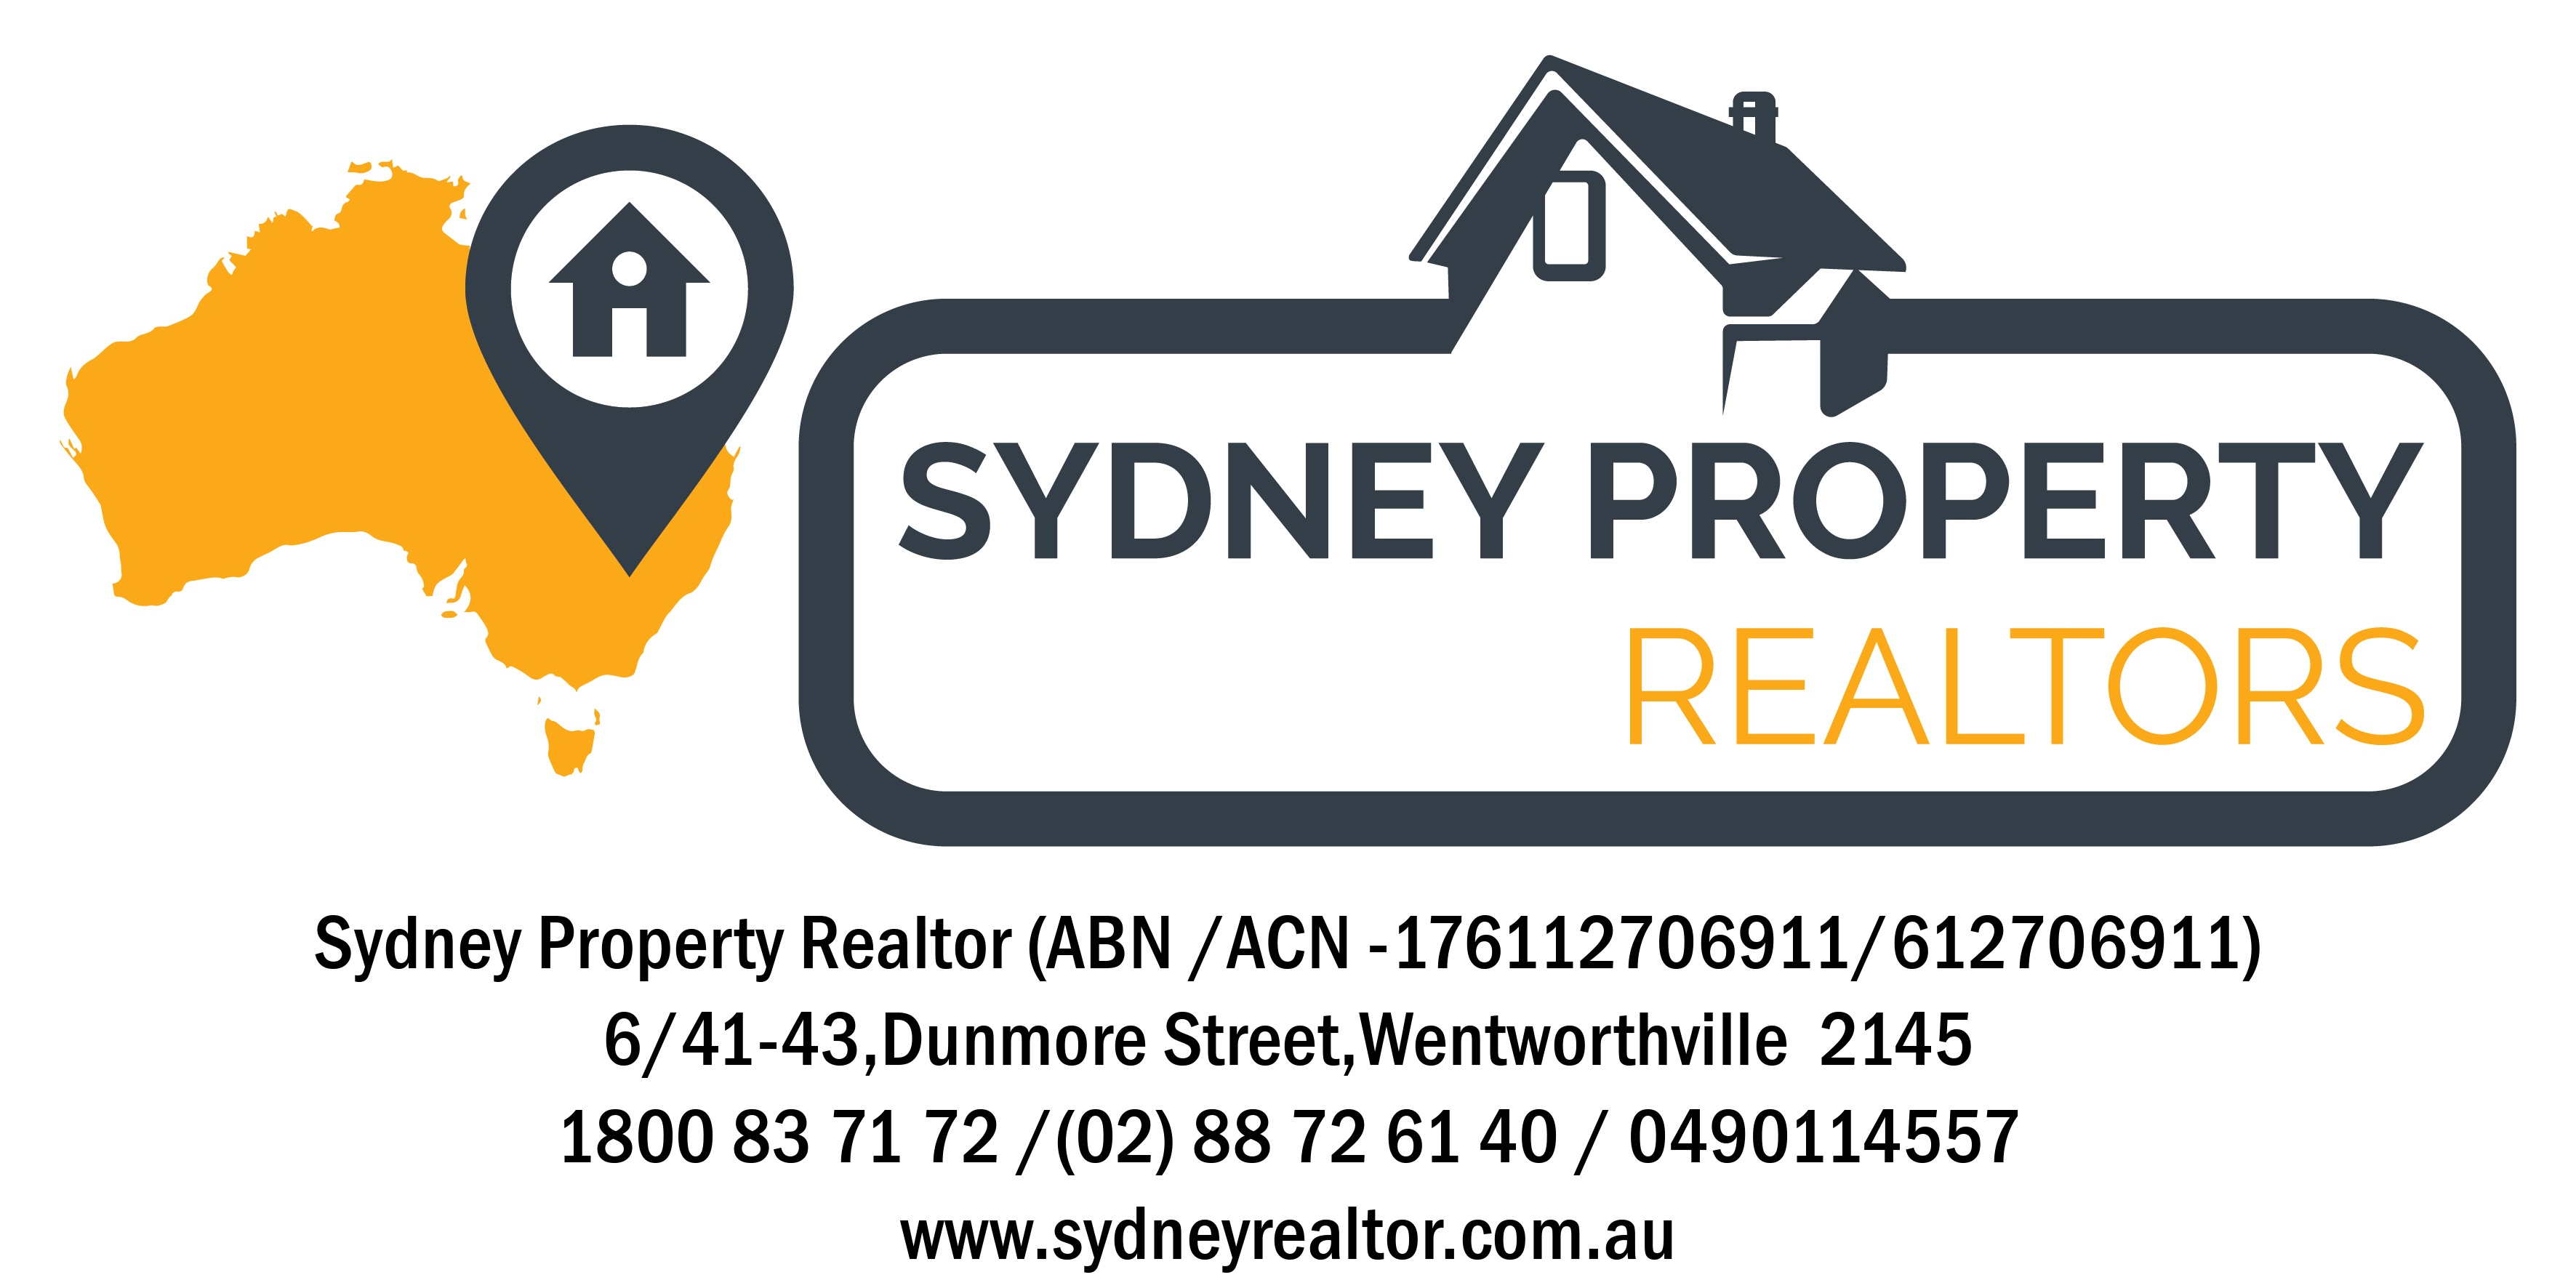 SYDNEY PROPERTY REALTORS, Wentworthville, 2145